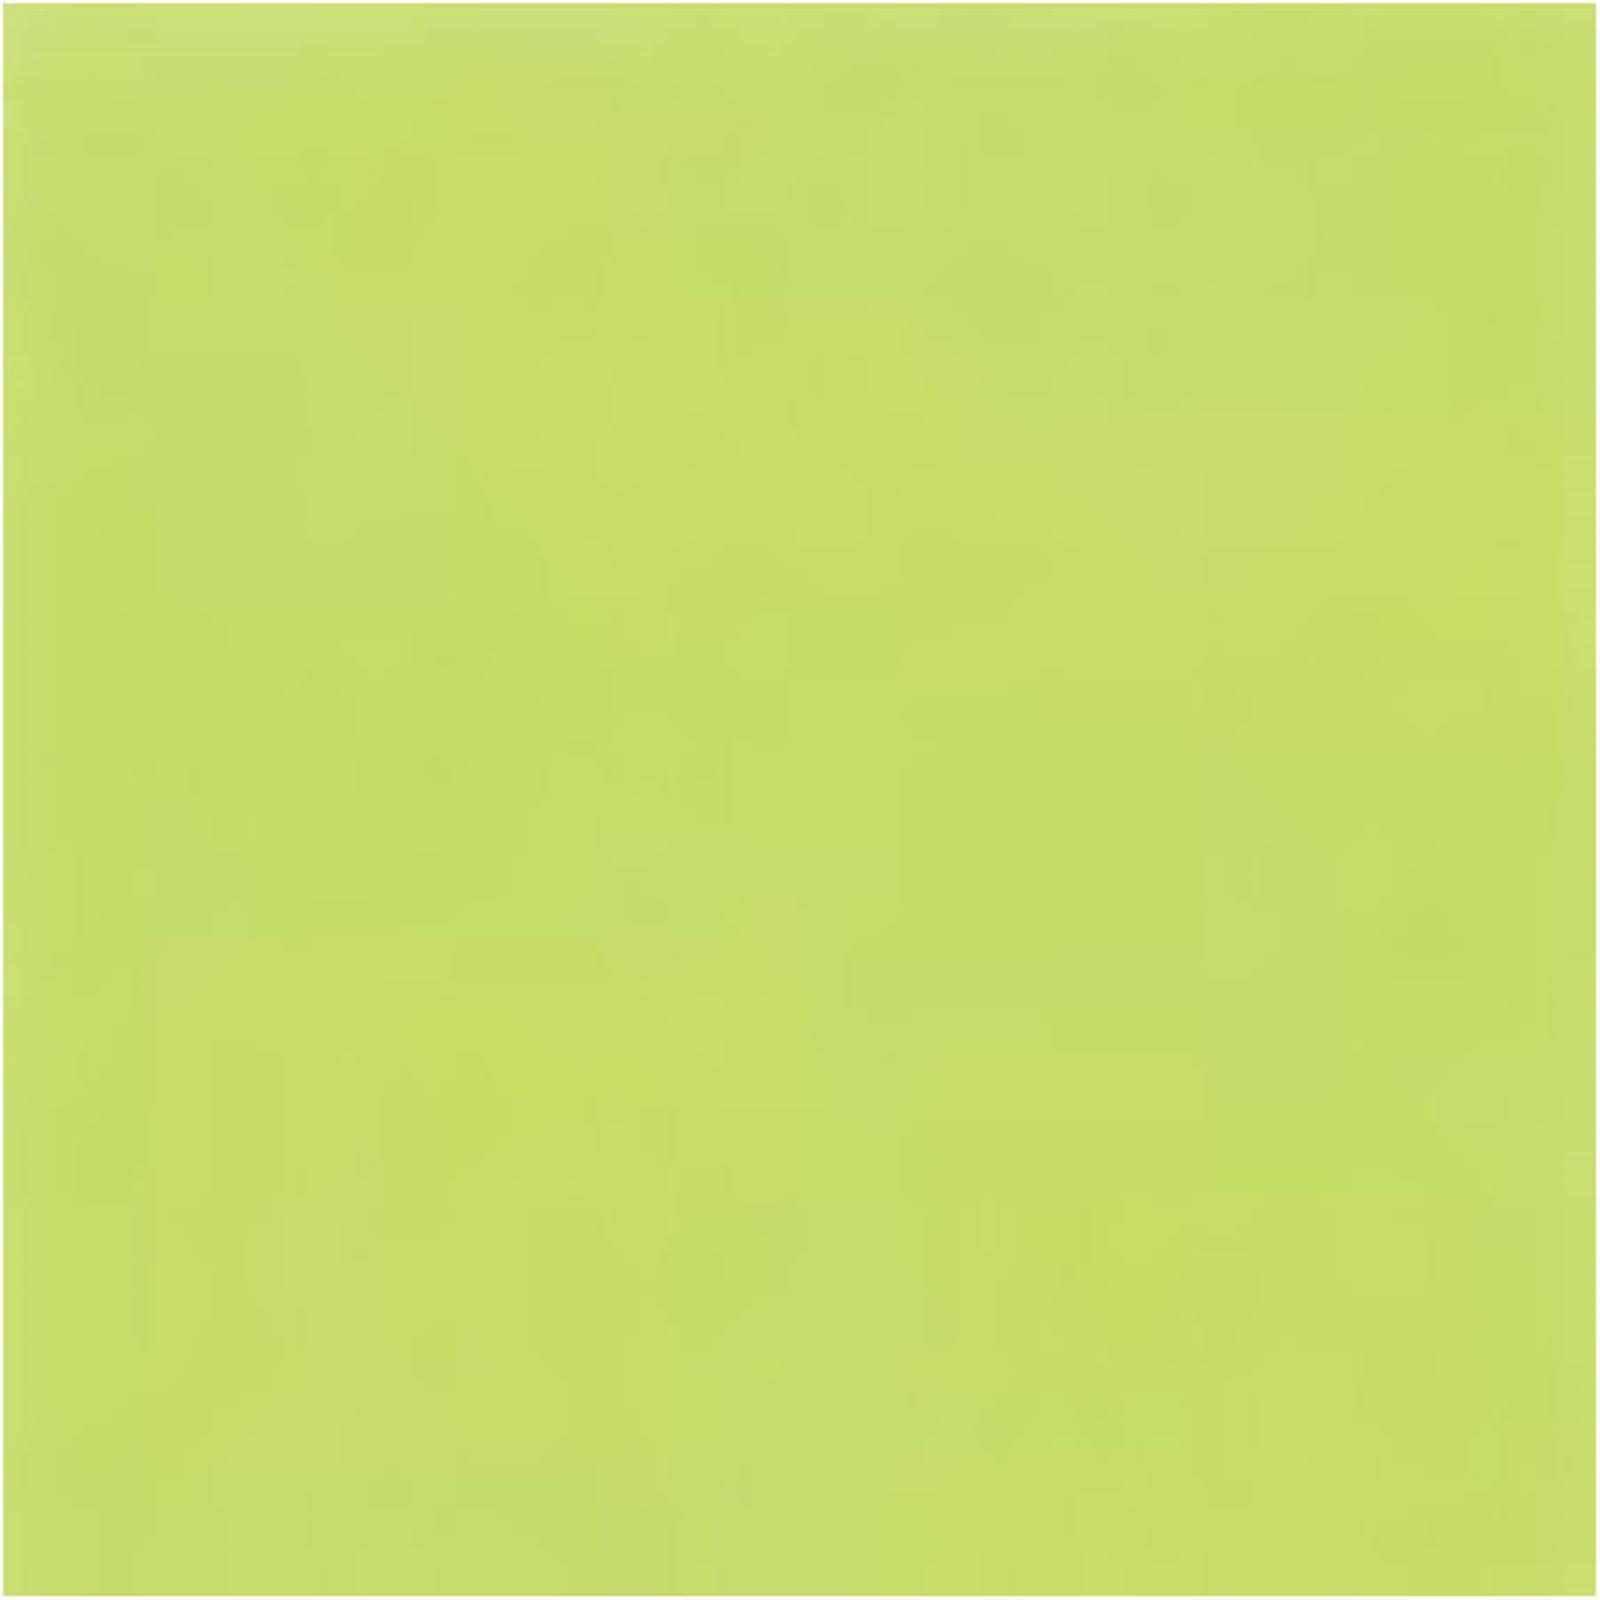 verde lime fosforescent